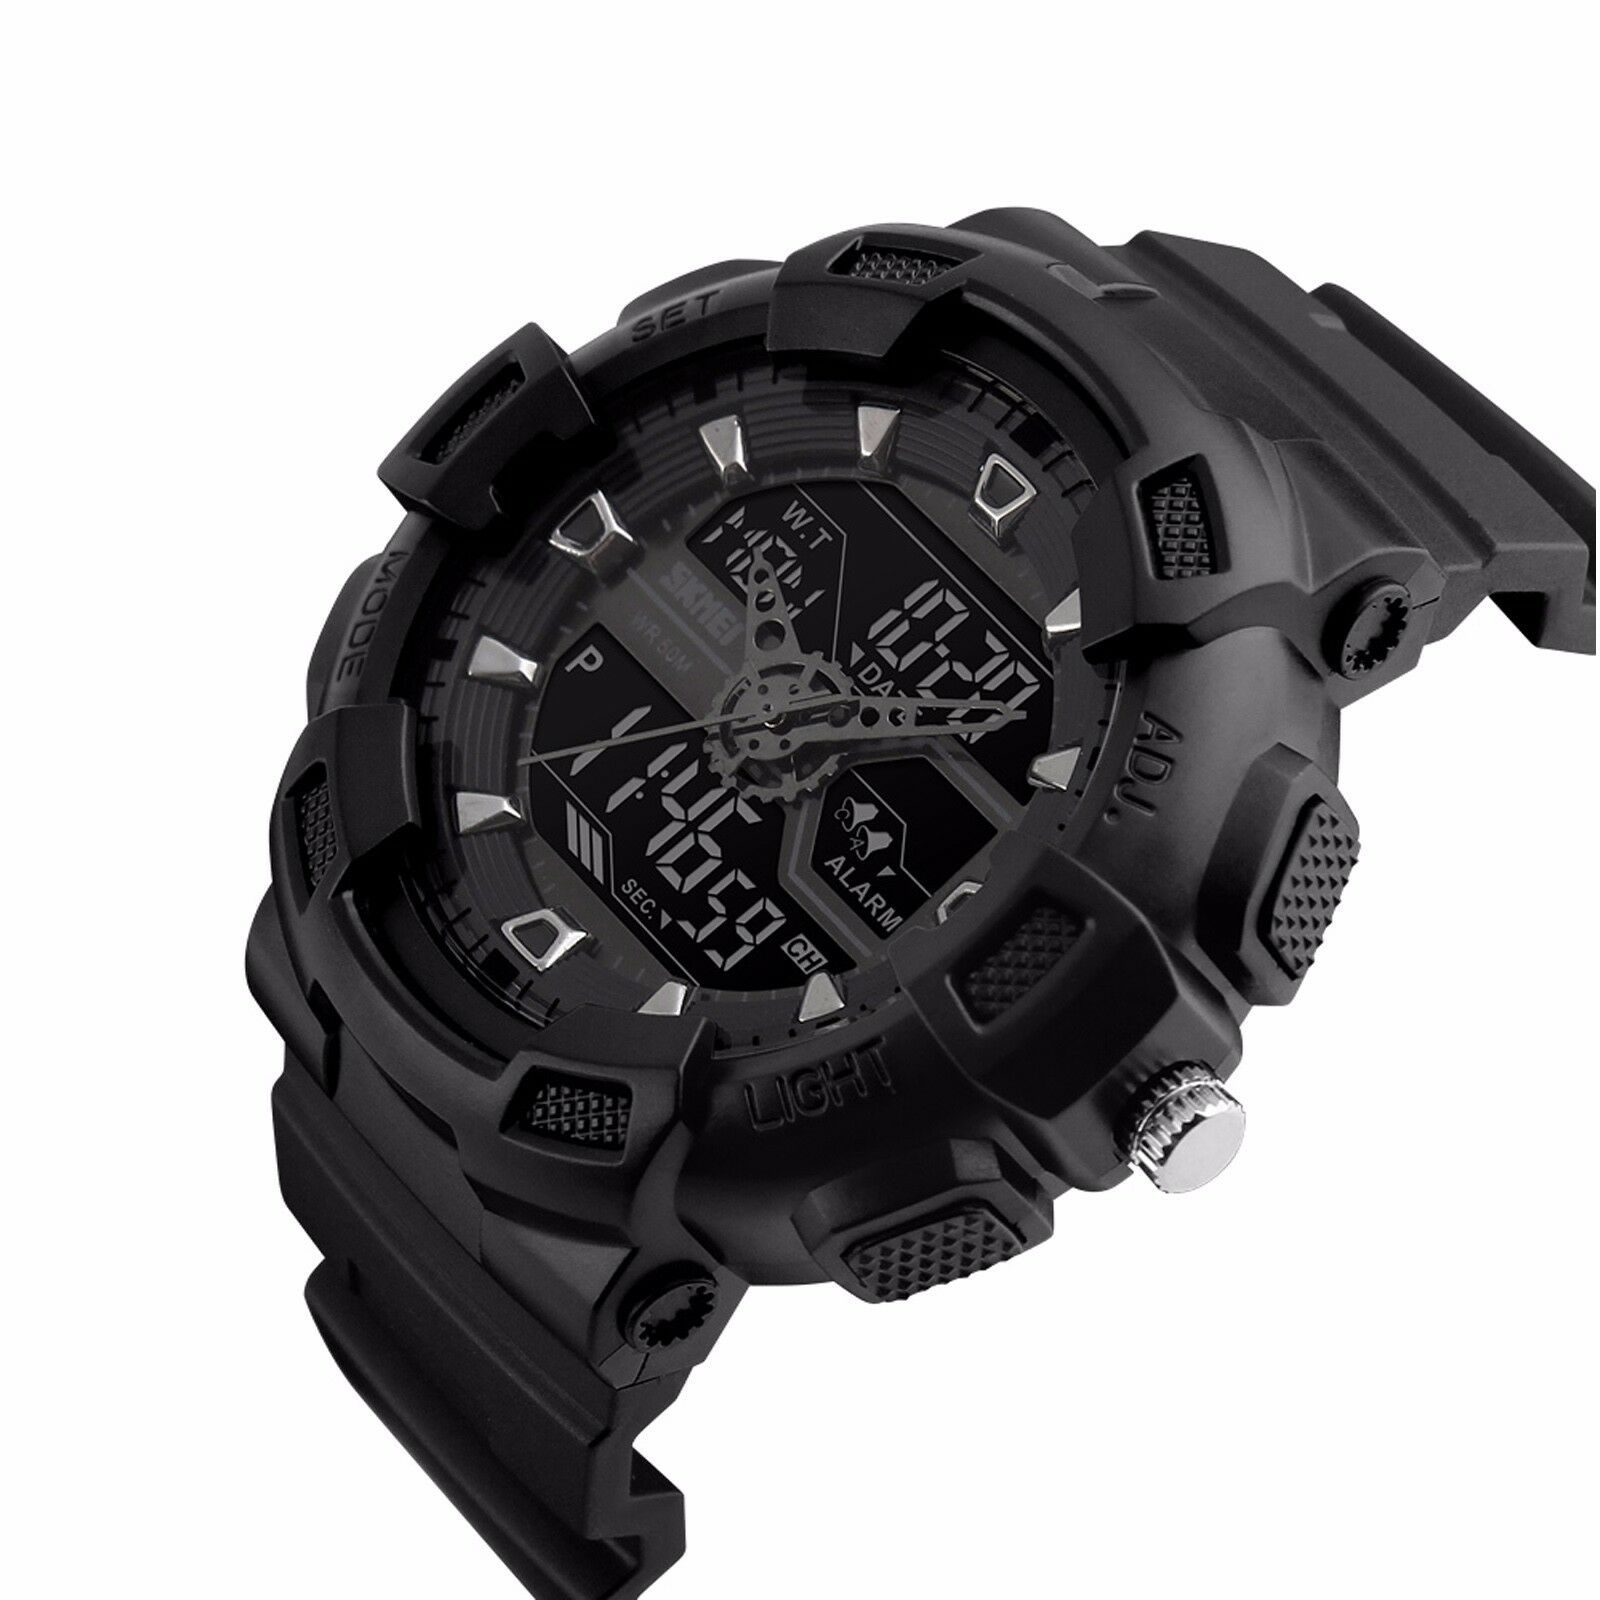 Mens Watches - Mens Military Sport Waterproof Date Alarm LED Analog Digital Watch Chronograph